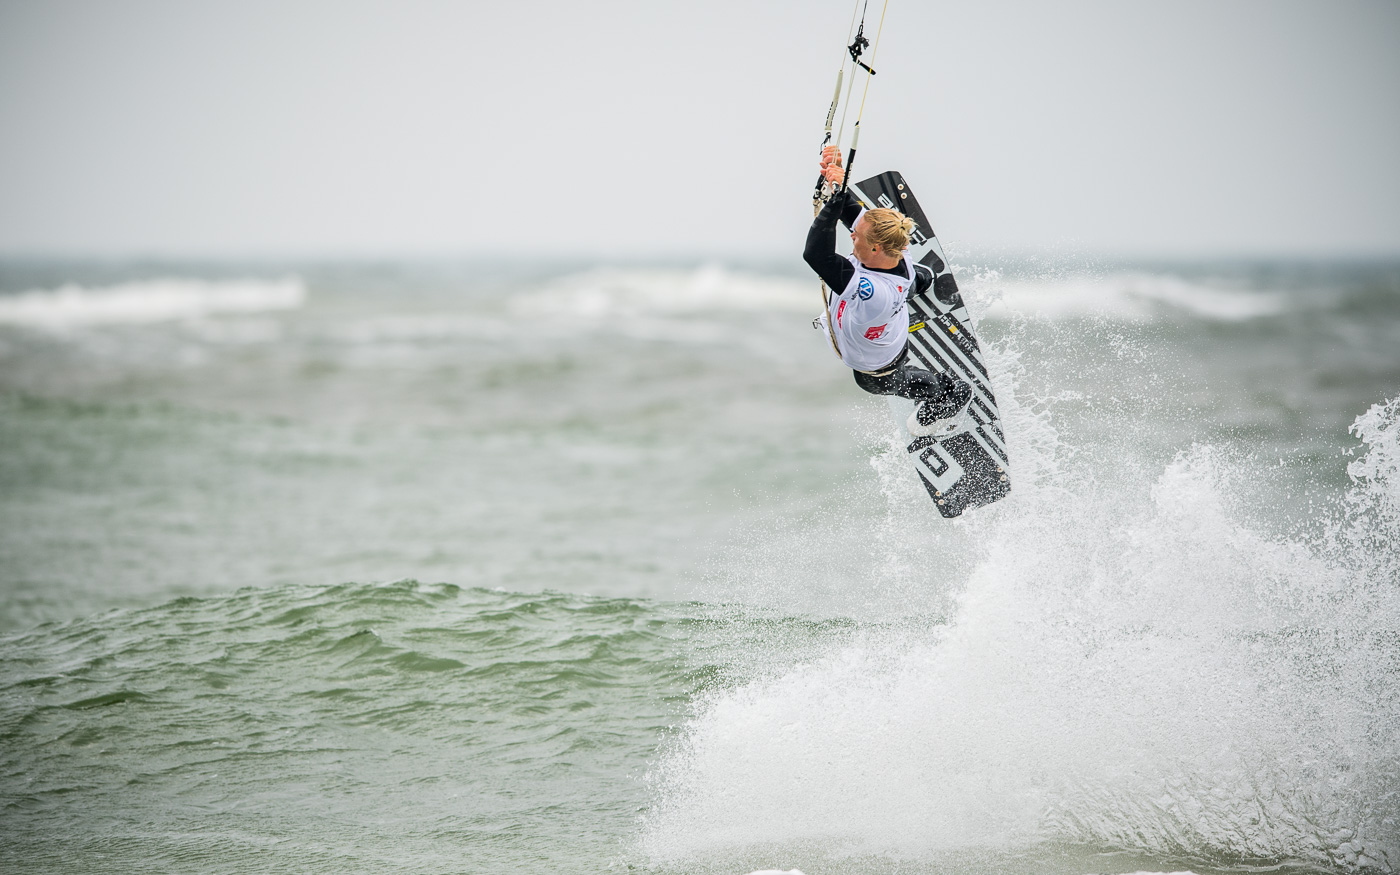 Linus Erdmann - Freestyle Ktesurfen